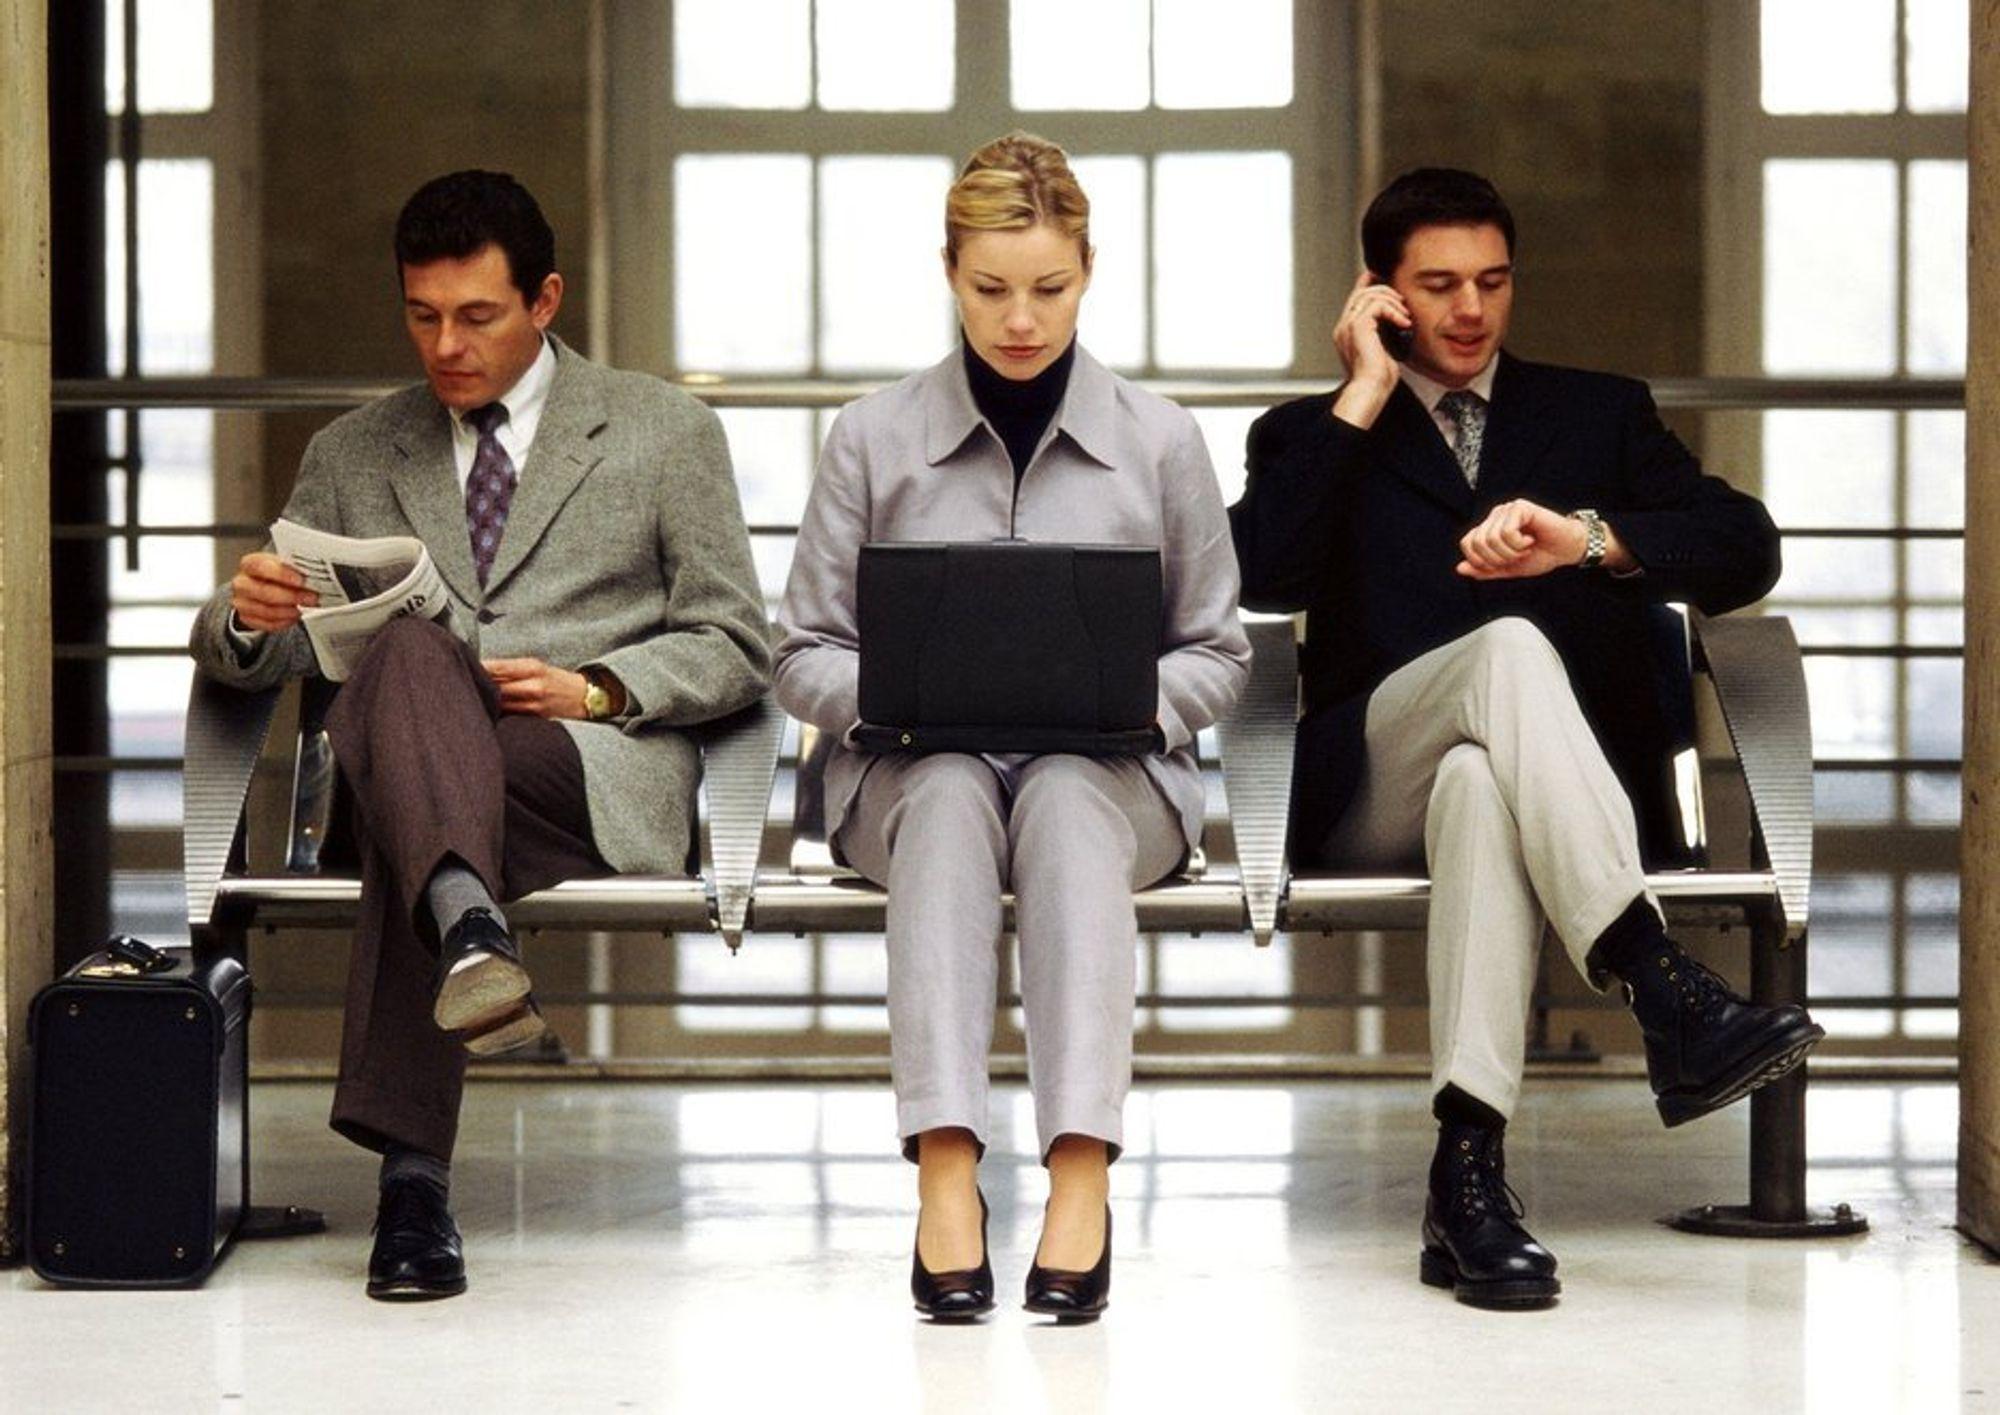 Hjernen til toppledere er annerledes skrudd sammen enn hjernene til ansatte i lavere stillinger, ifølge norsk studie.